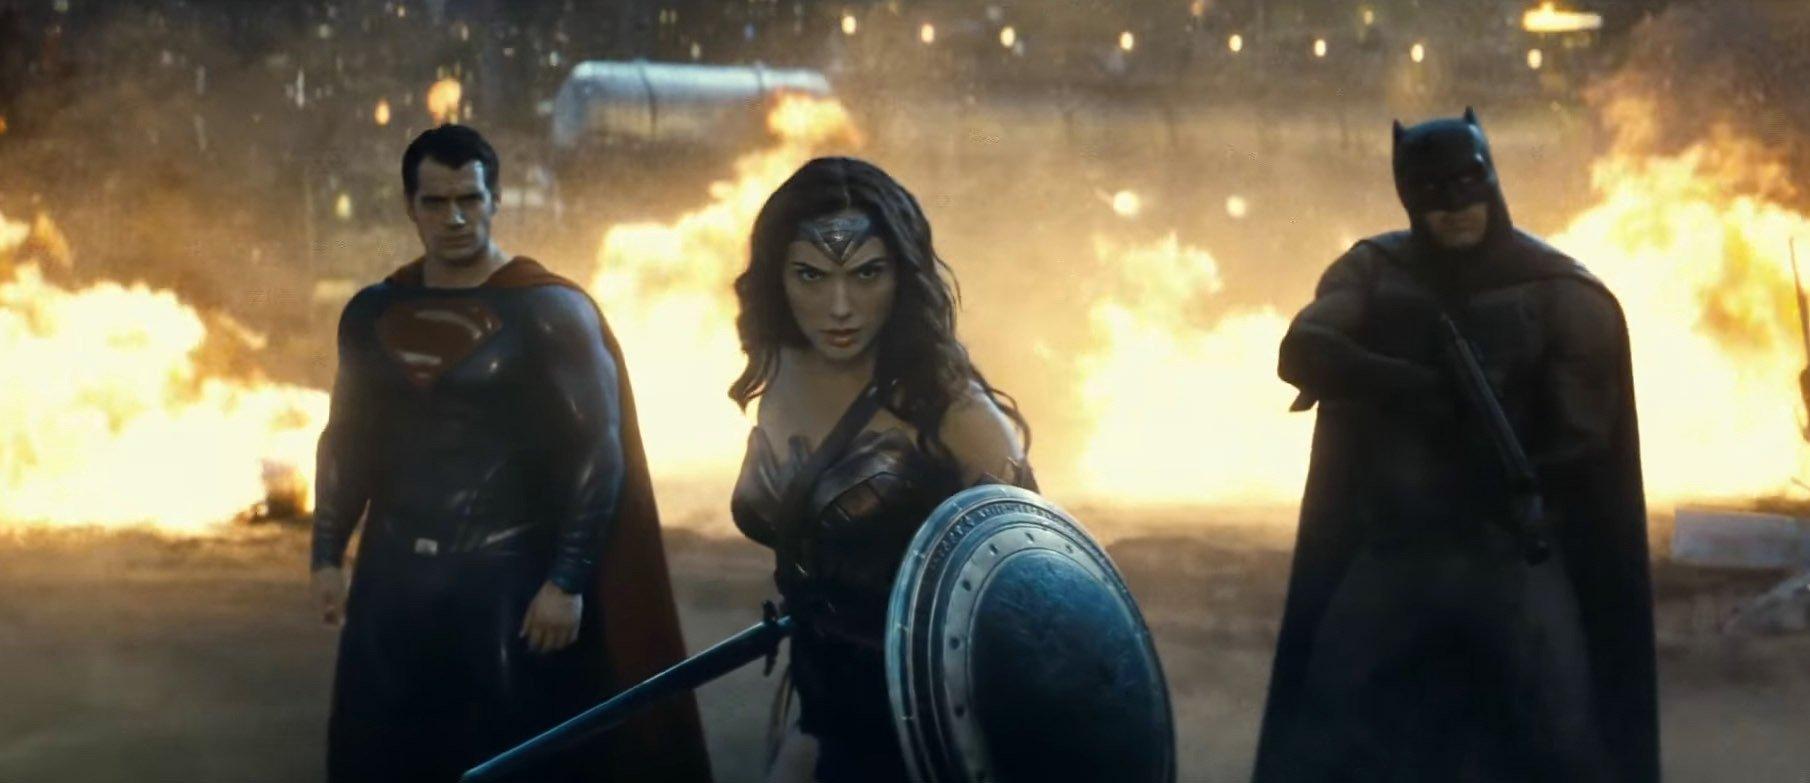 Batman-v-superman-trailer-doomsday-61489-1-